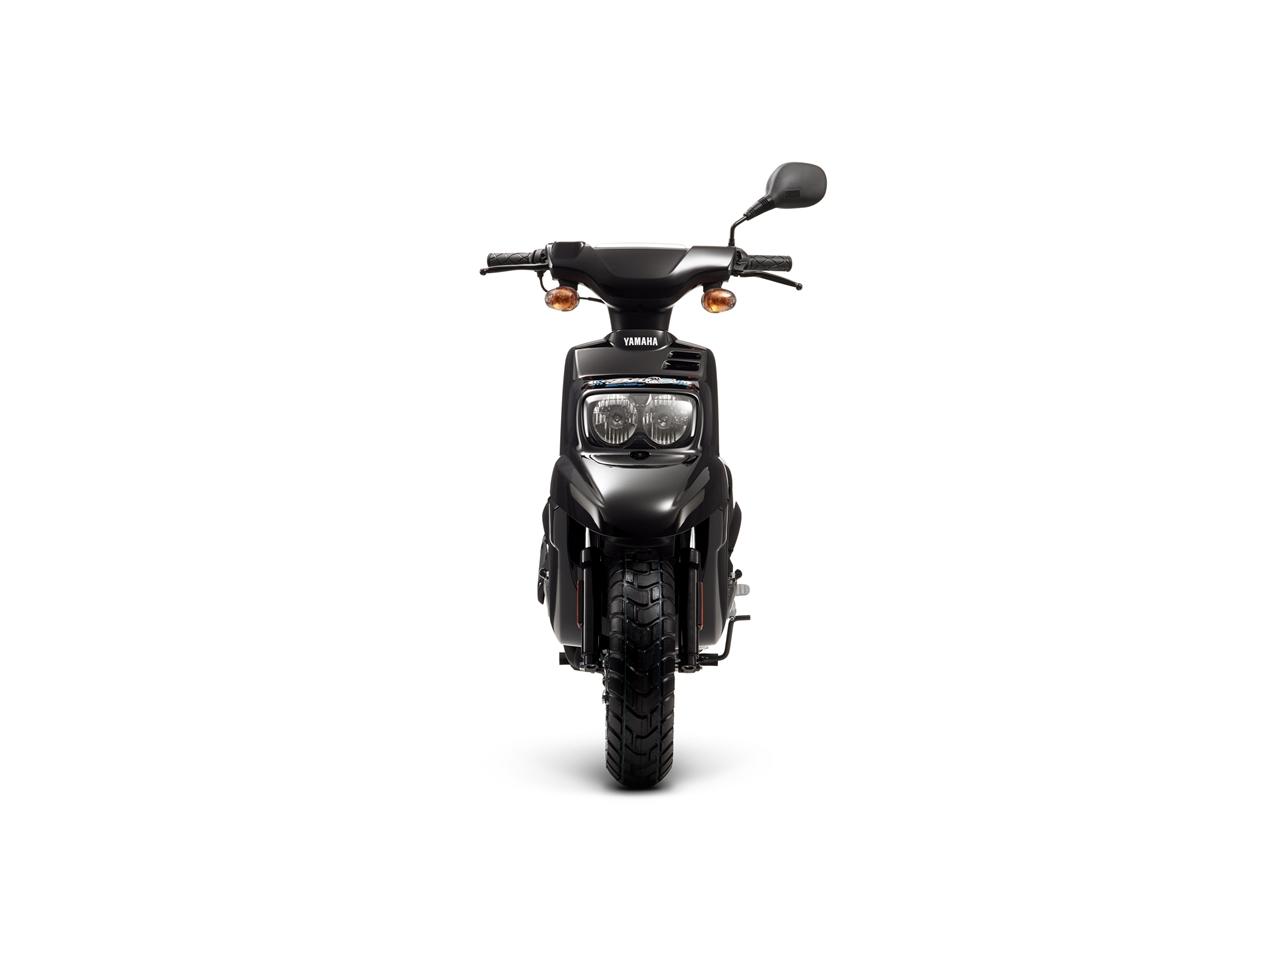 Yamaha BW\'s Easy m.y. 2013